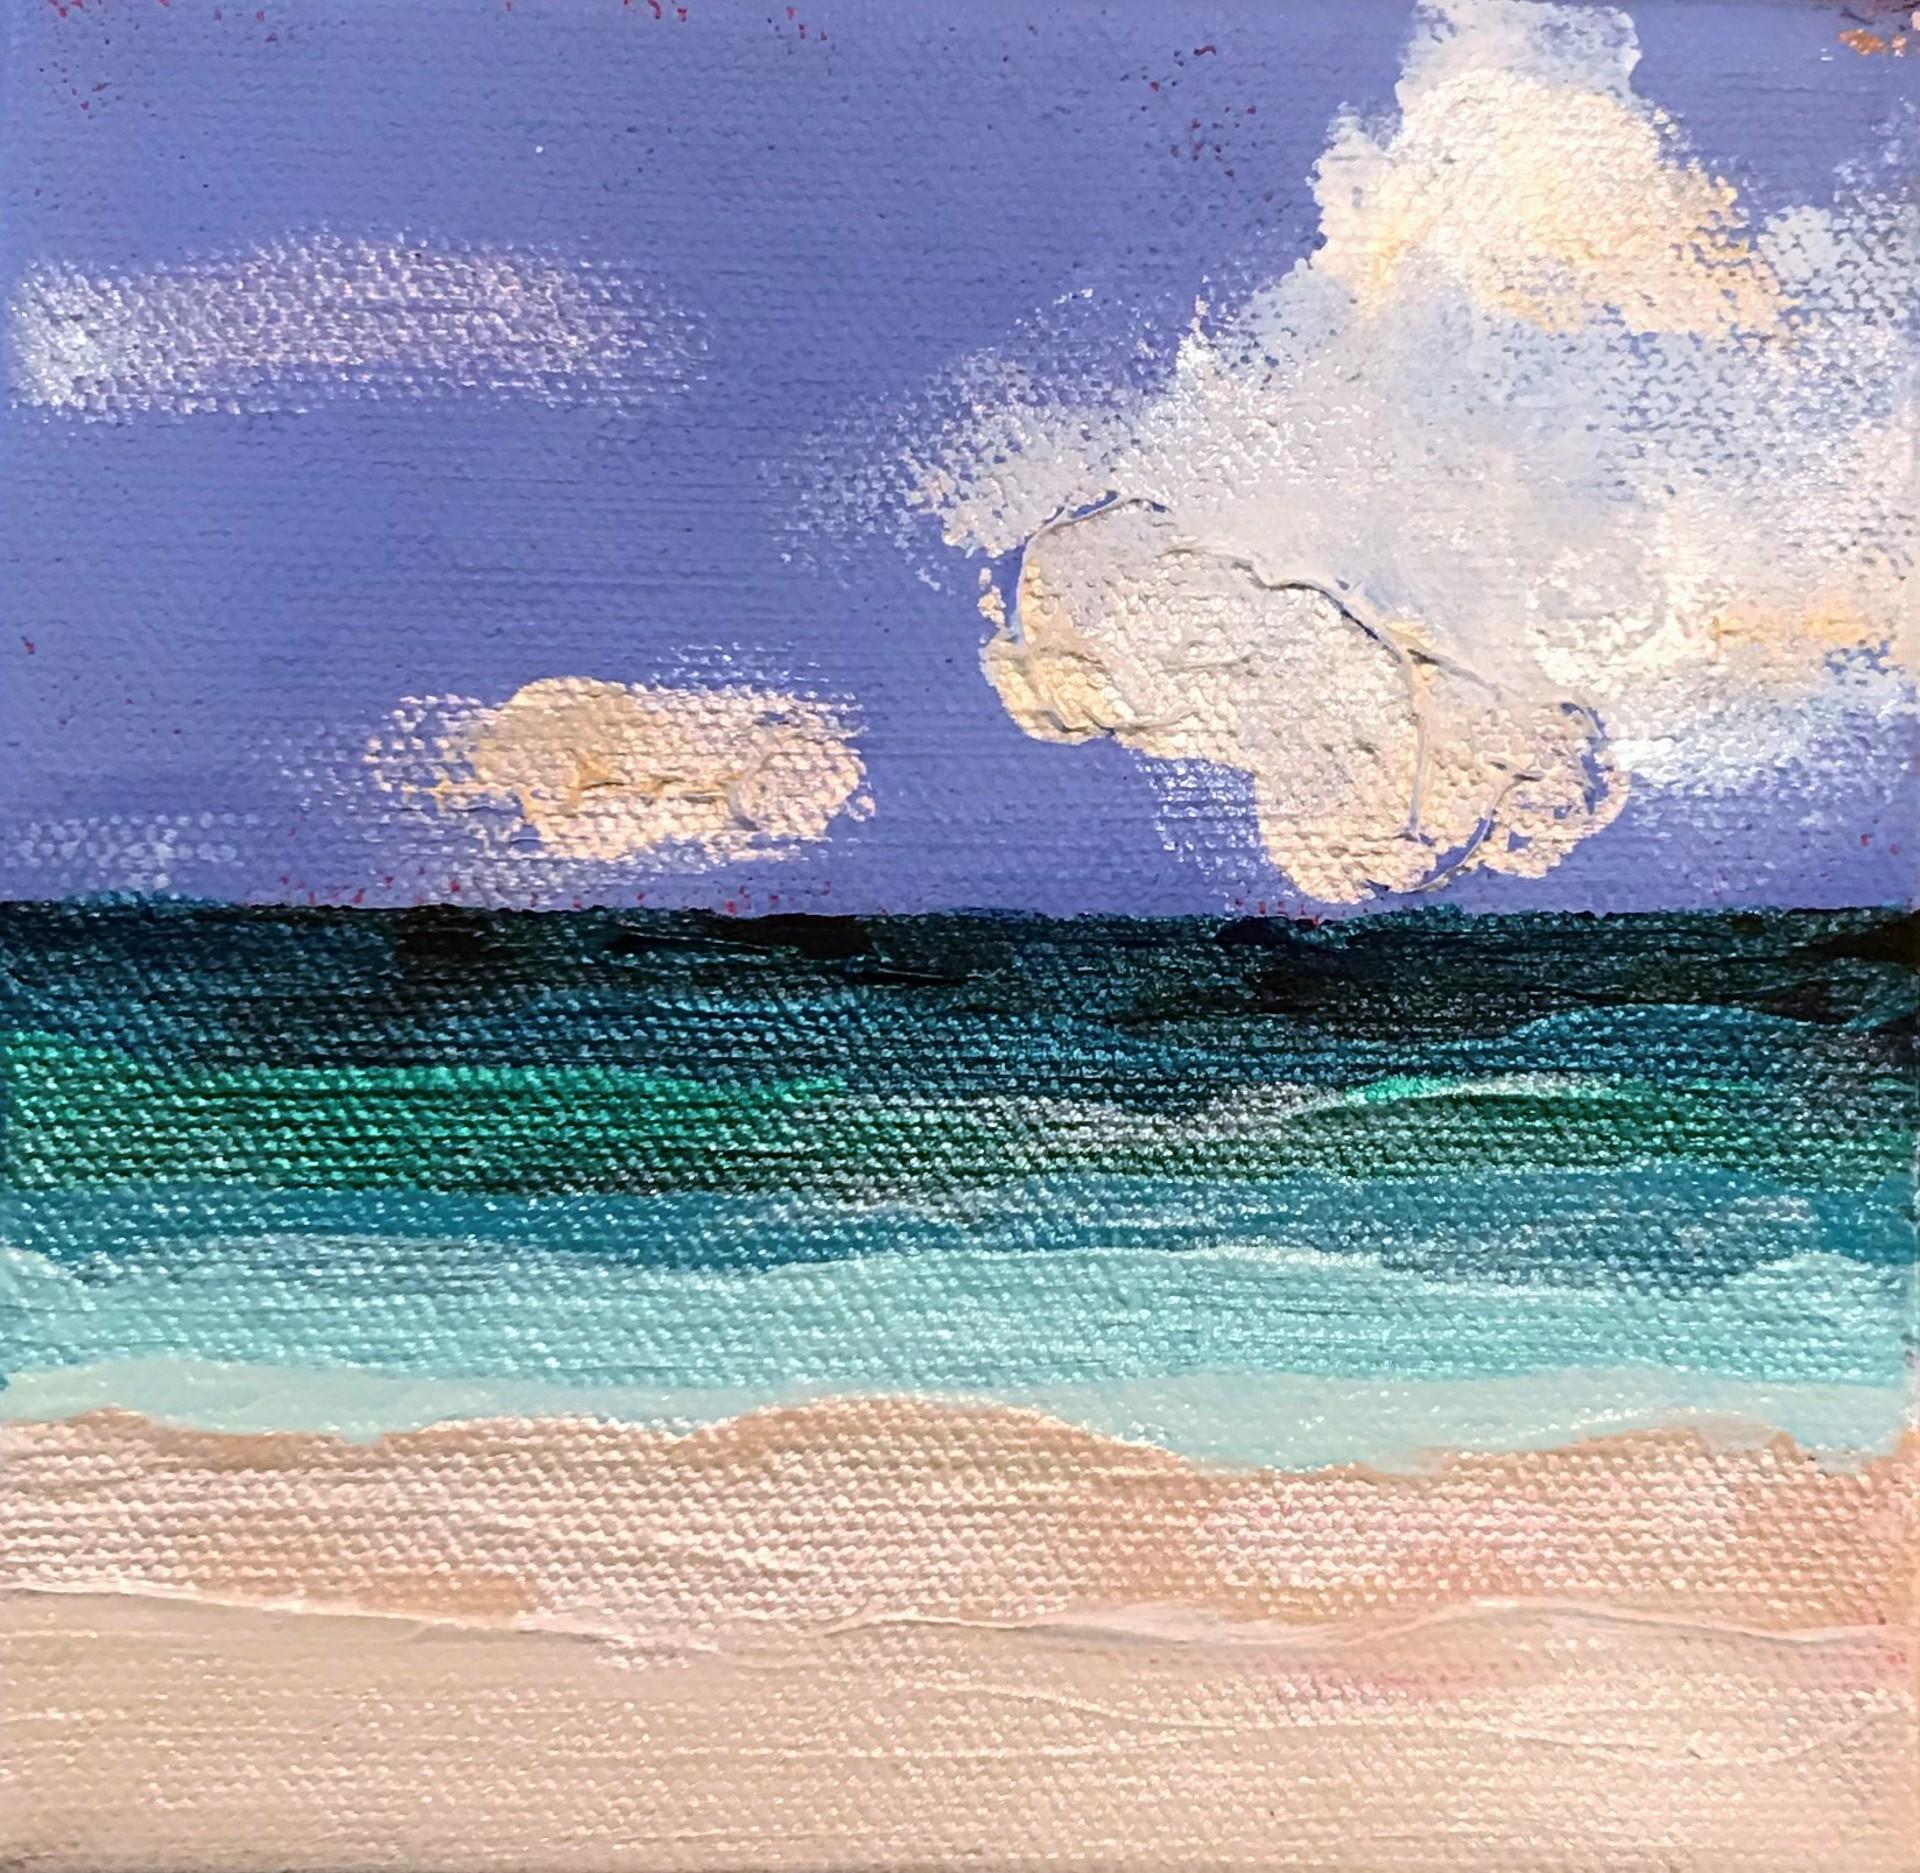 Beachfront No. 6 by Leslie Poteet Busker